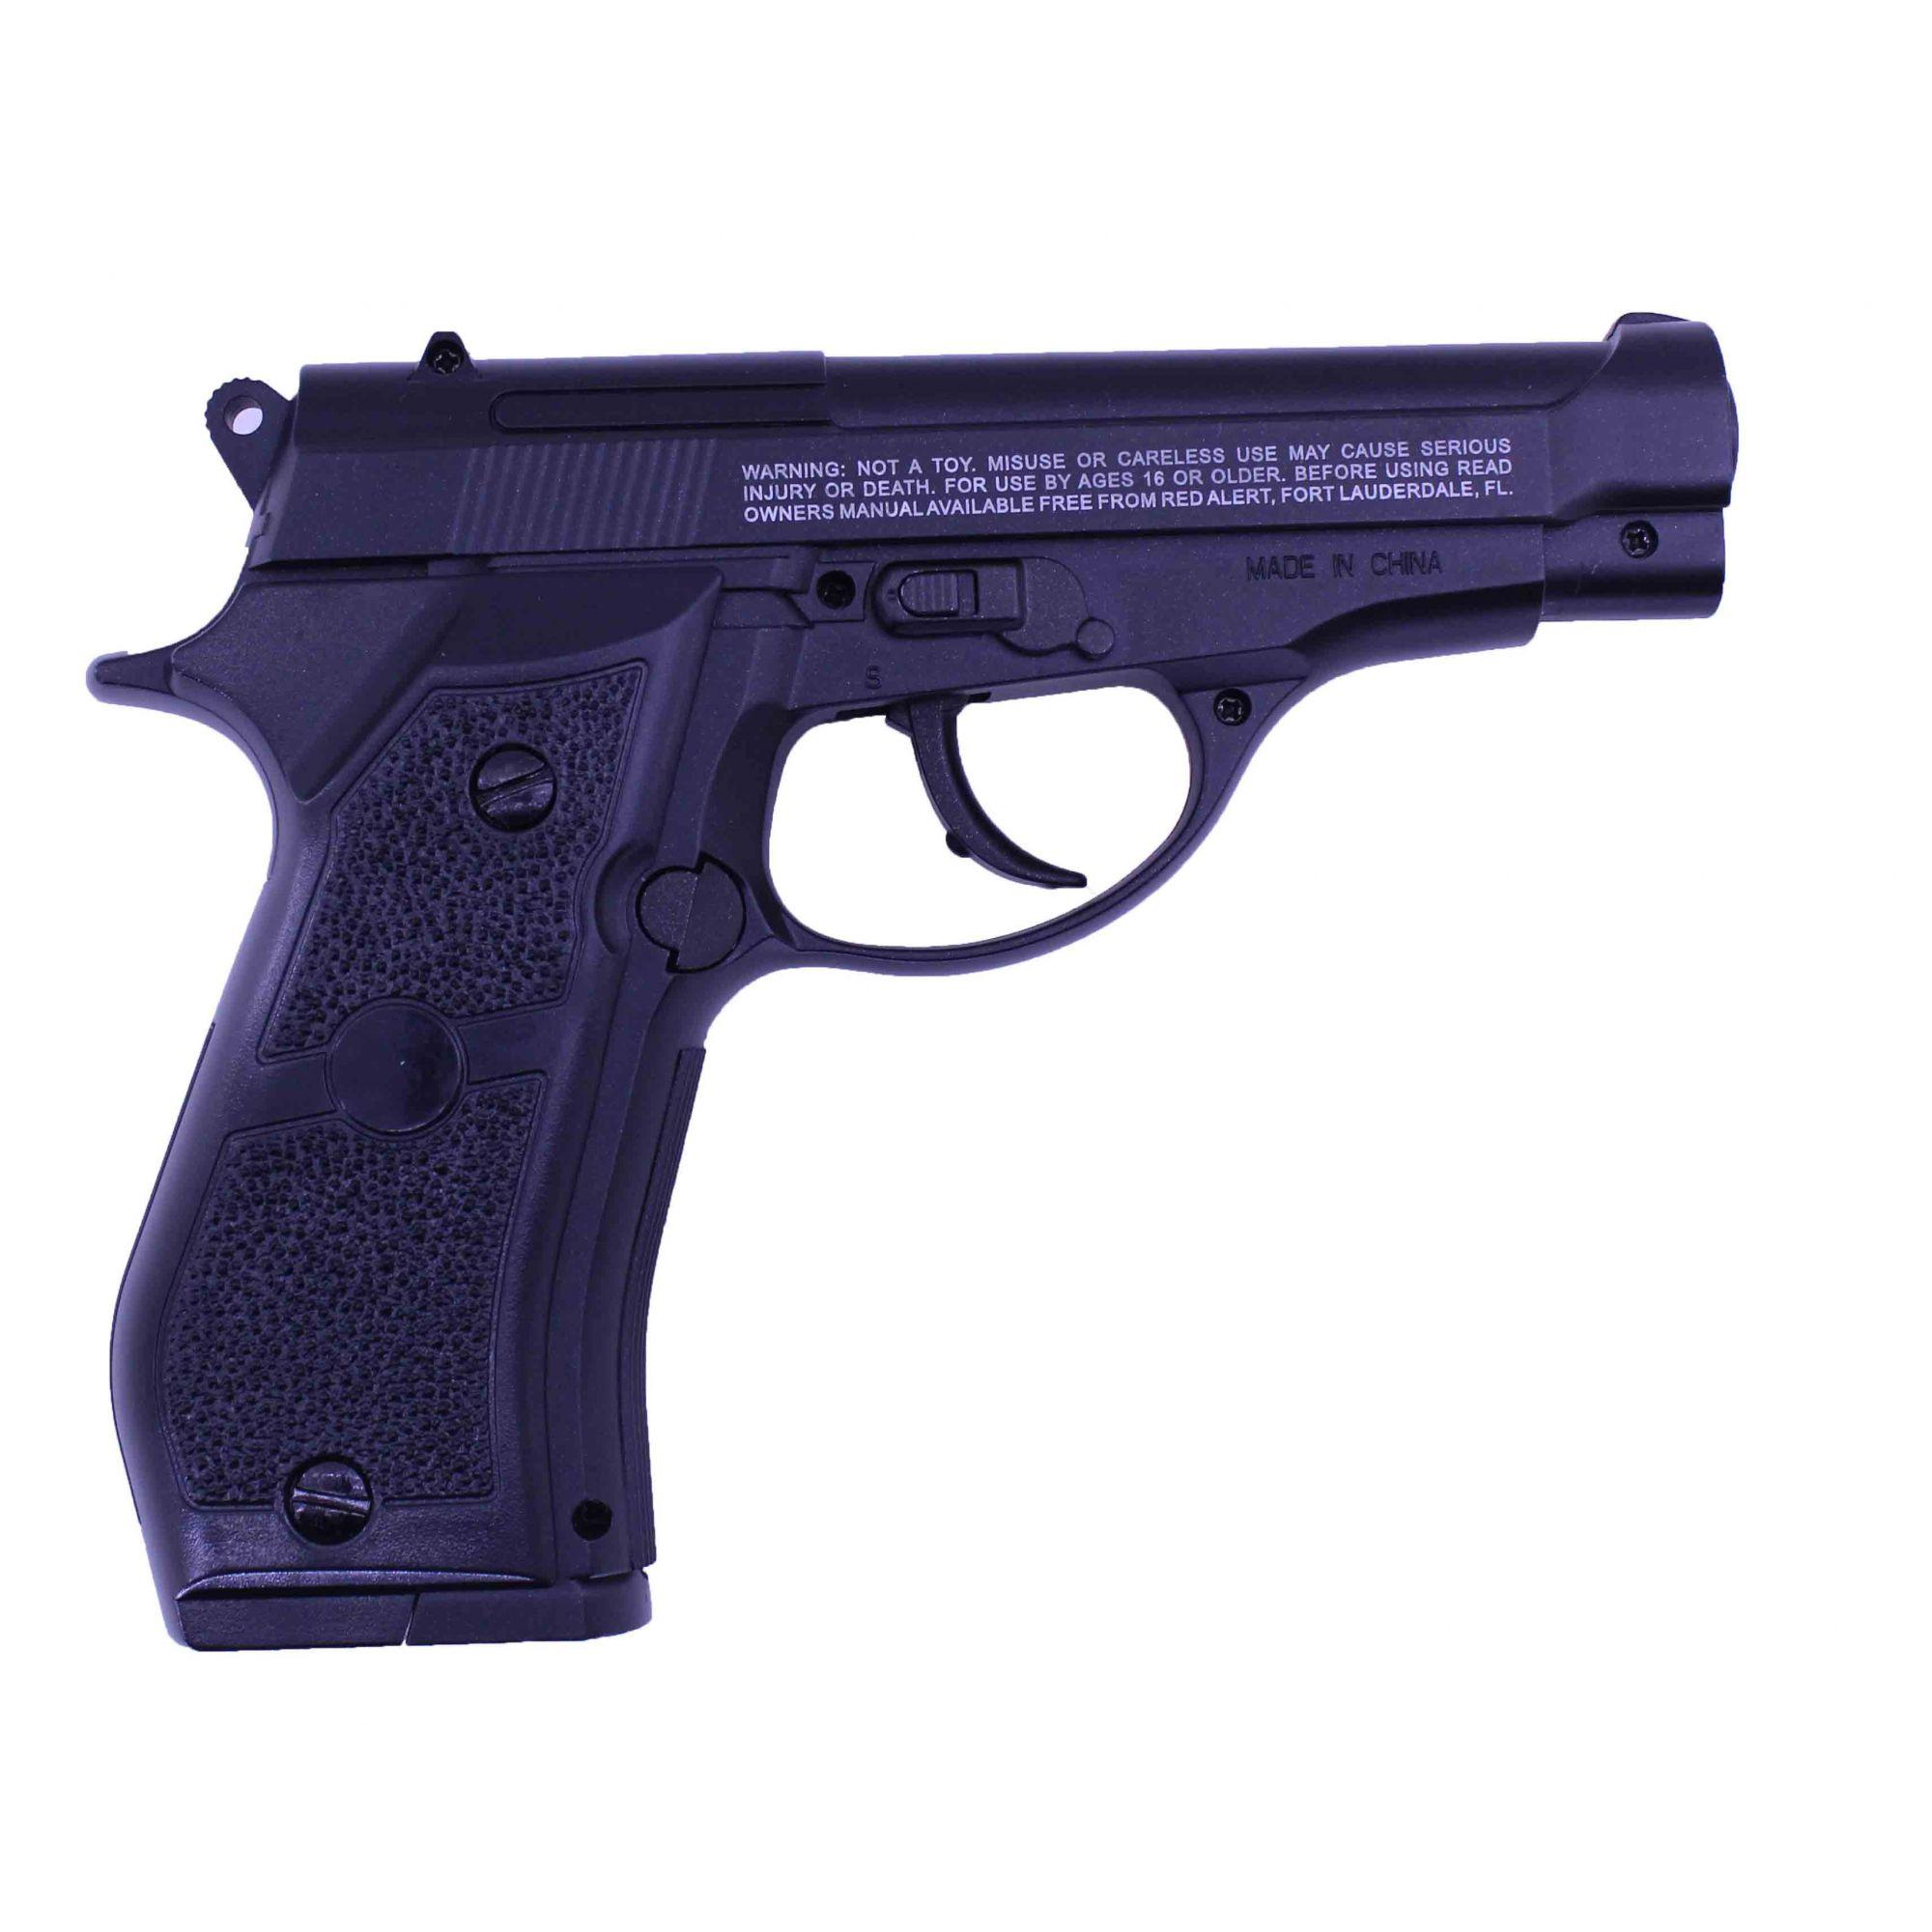 Pistola de Pressão Red Alert RD-Compact Co2 4,5mm